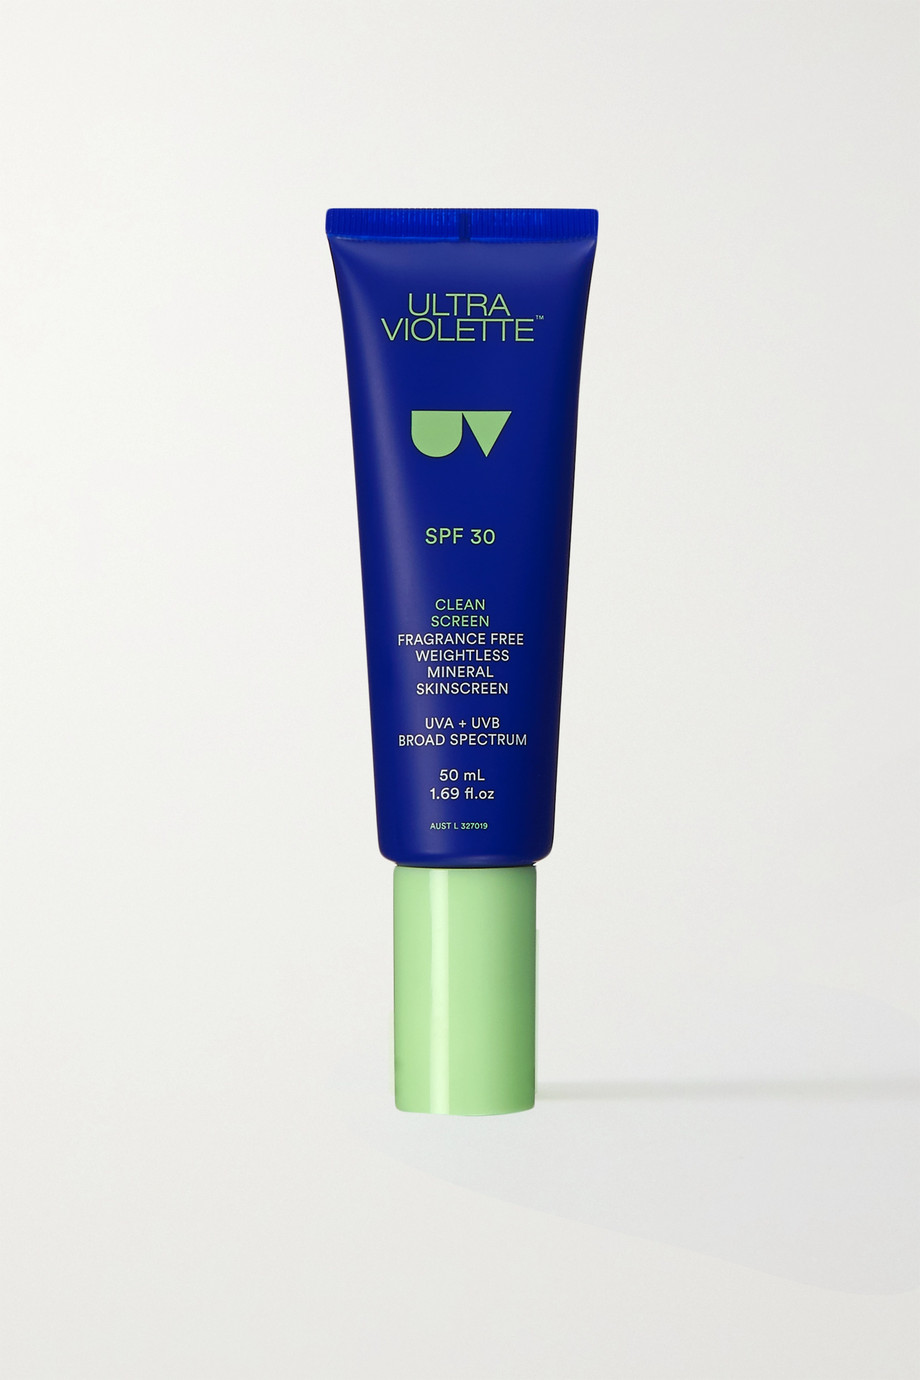 Ultra Violette Clean Screen Skinscreen LSF 30, 50 ml – Sonnencreme